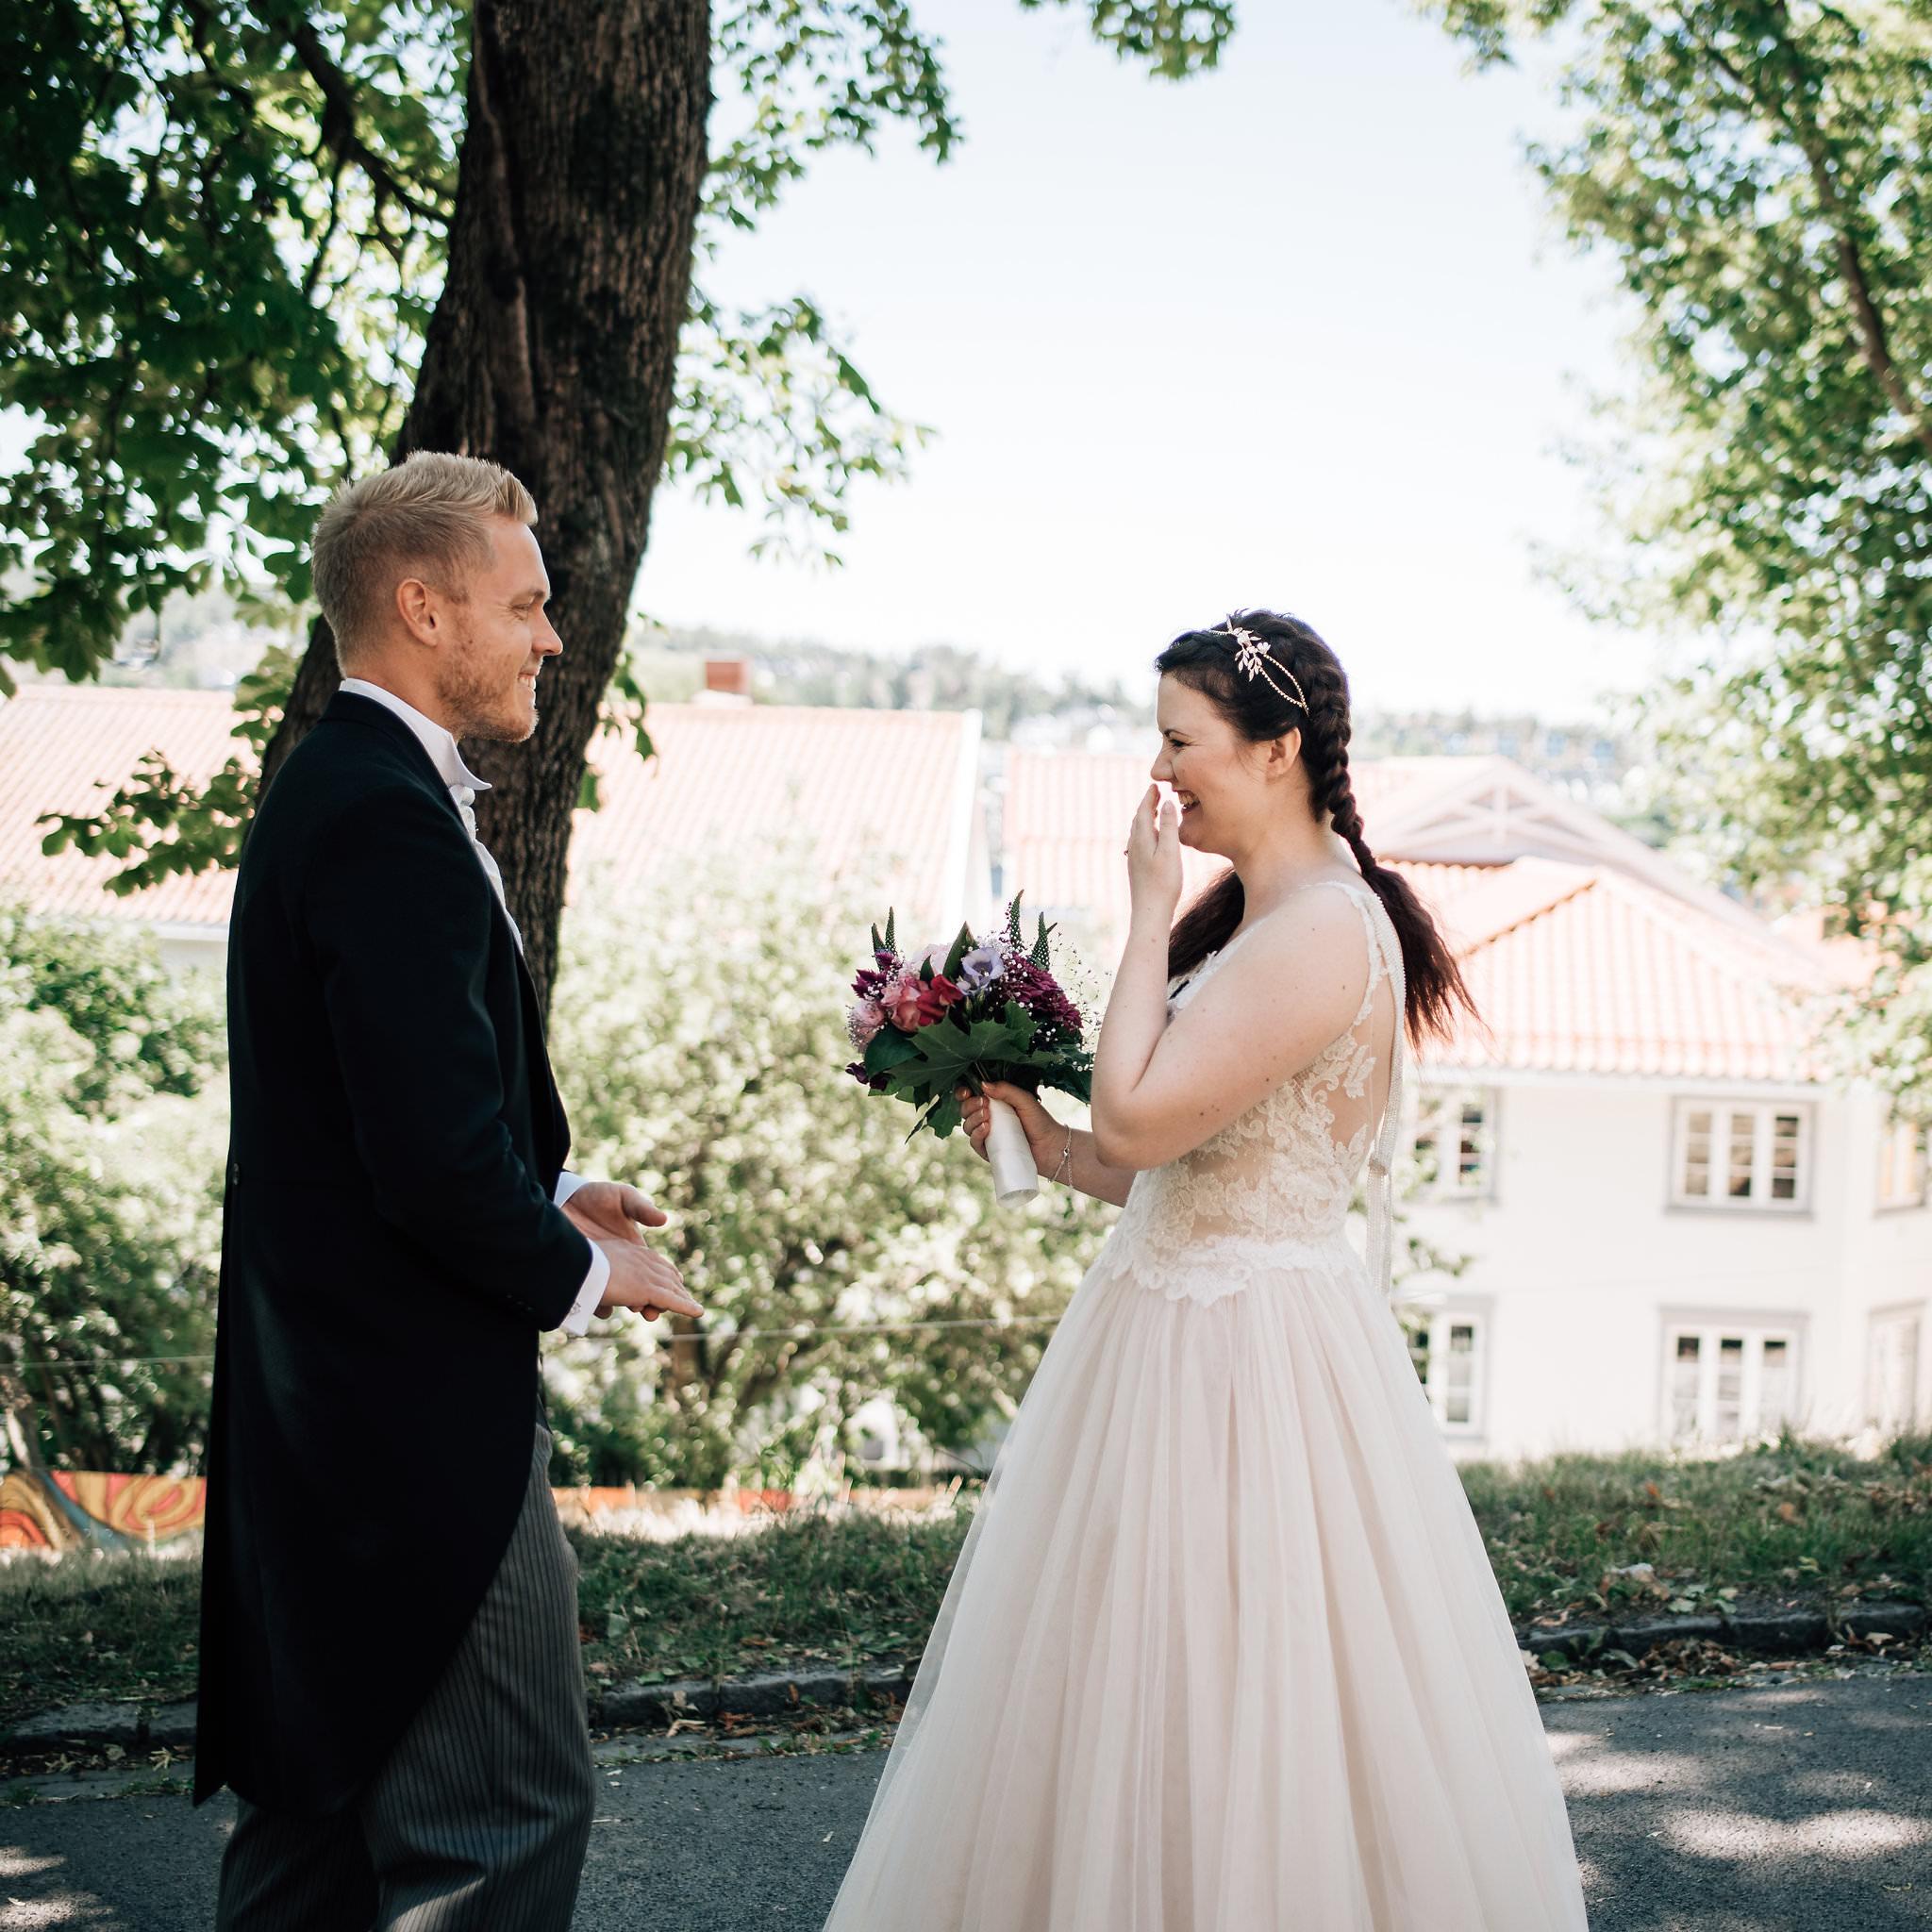 750_3509-fotograf-vestfold-bryllupsfotograf-.jpg